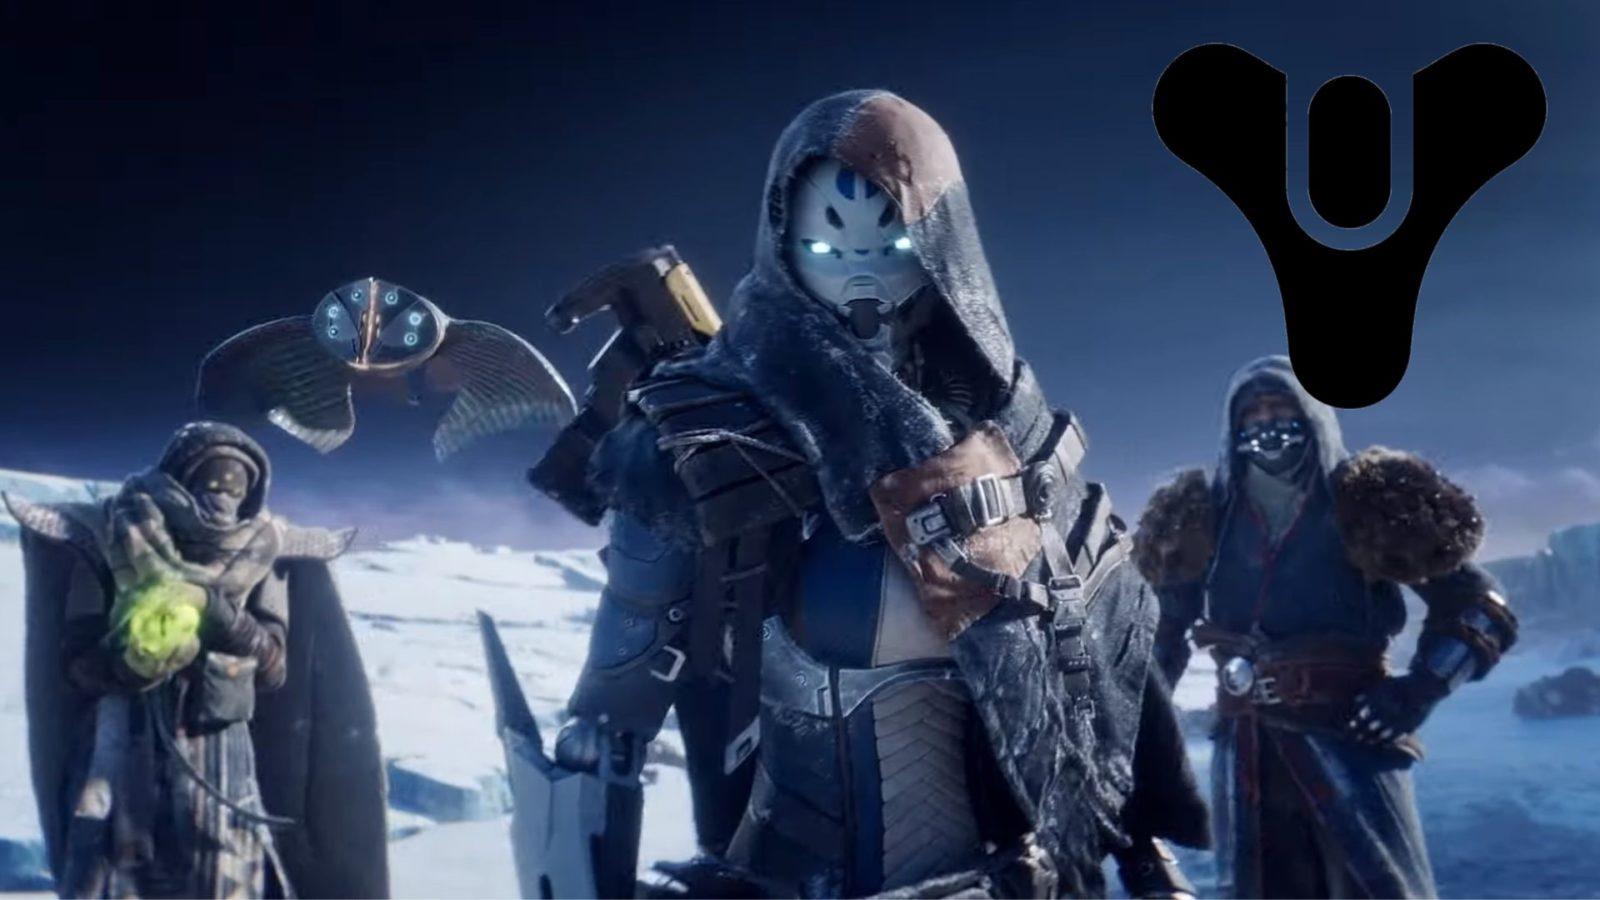 guardians in destiny 2 beyond light